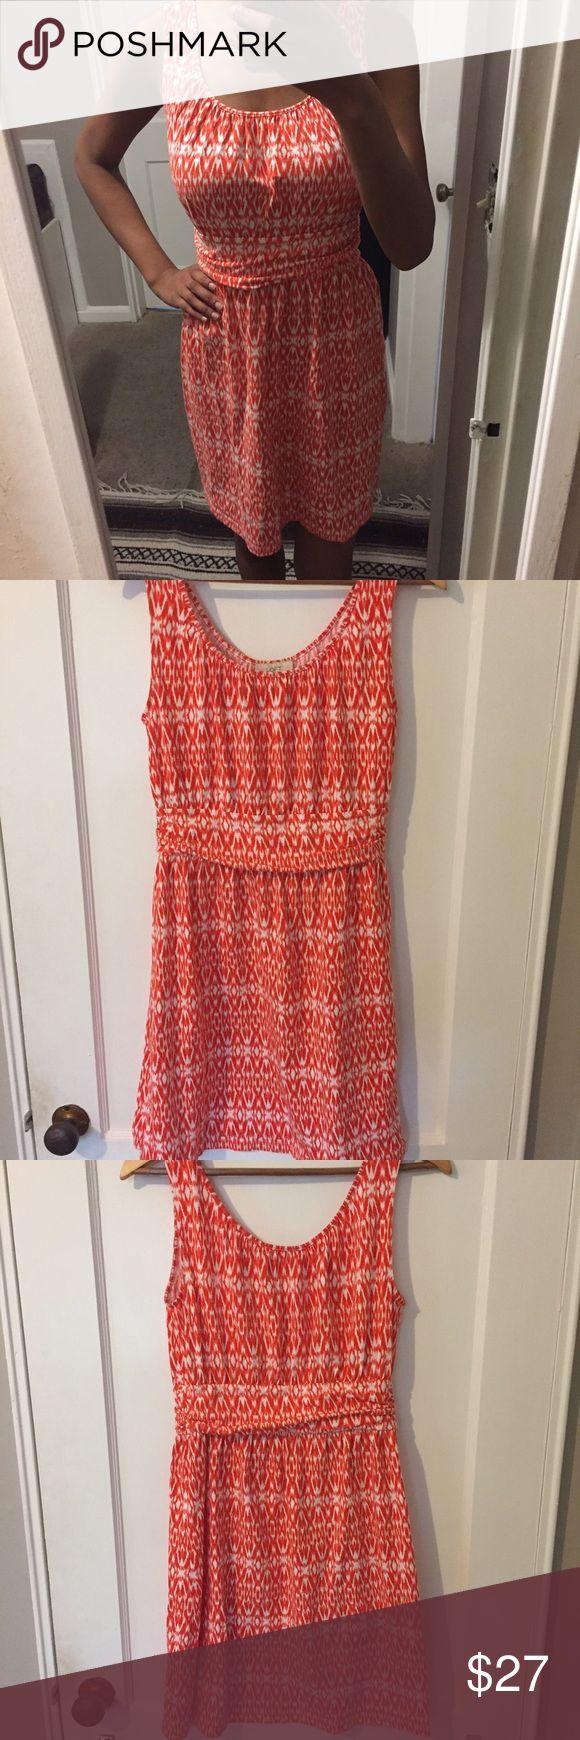 "Loft Orange Printed Dress In Great Condition 95% Cotton 5% Spandex Bust:14"" Length: 35"" LOFT Dresses"